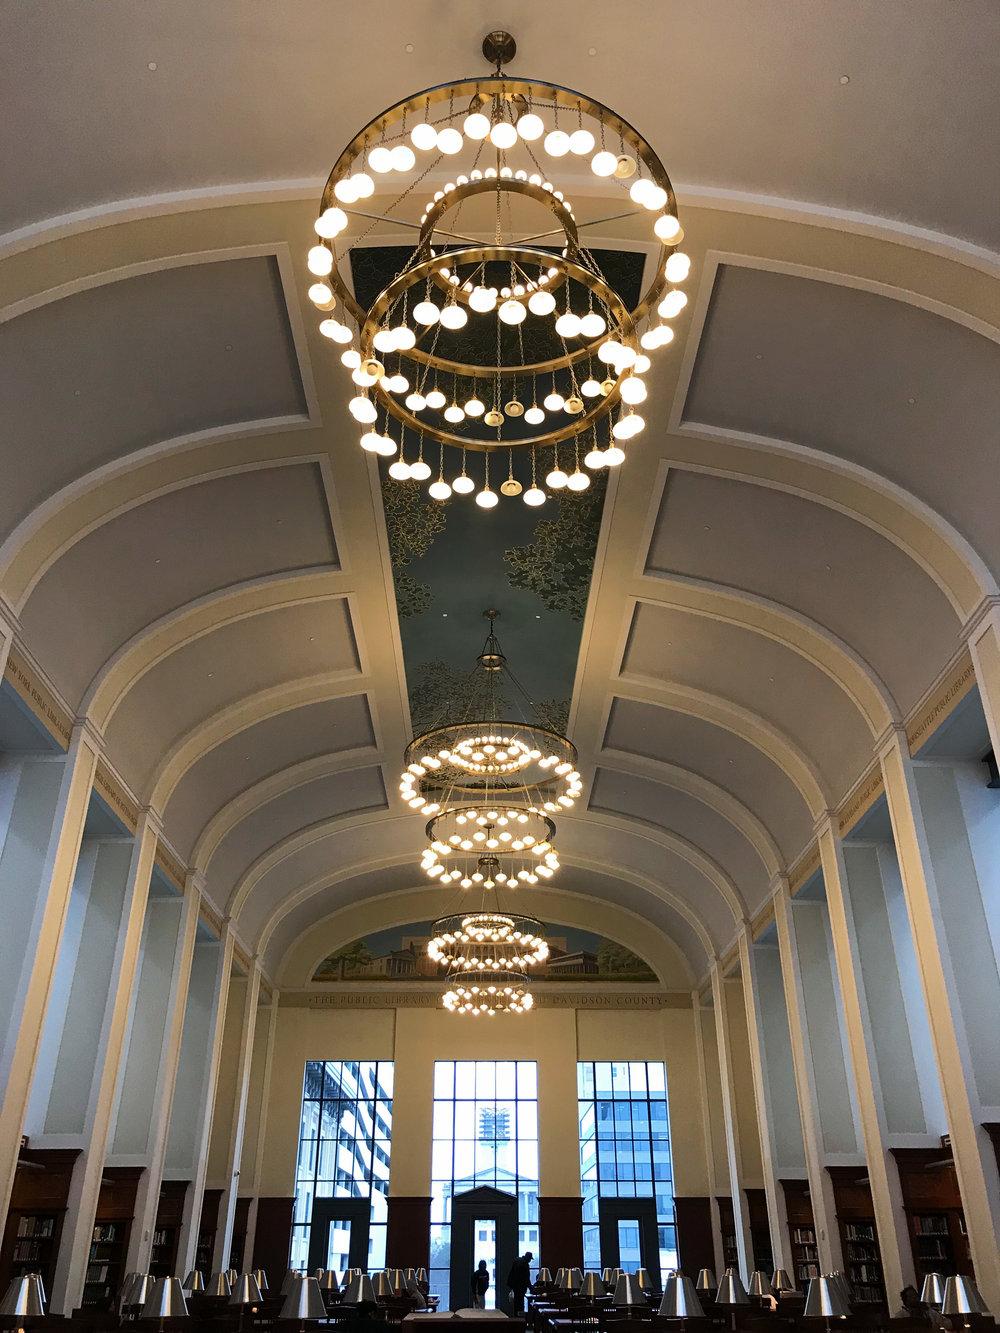 Nashville Public Library | Nashville, Tennessee